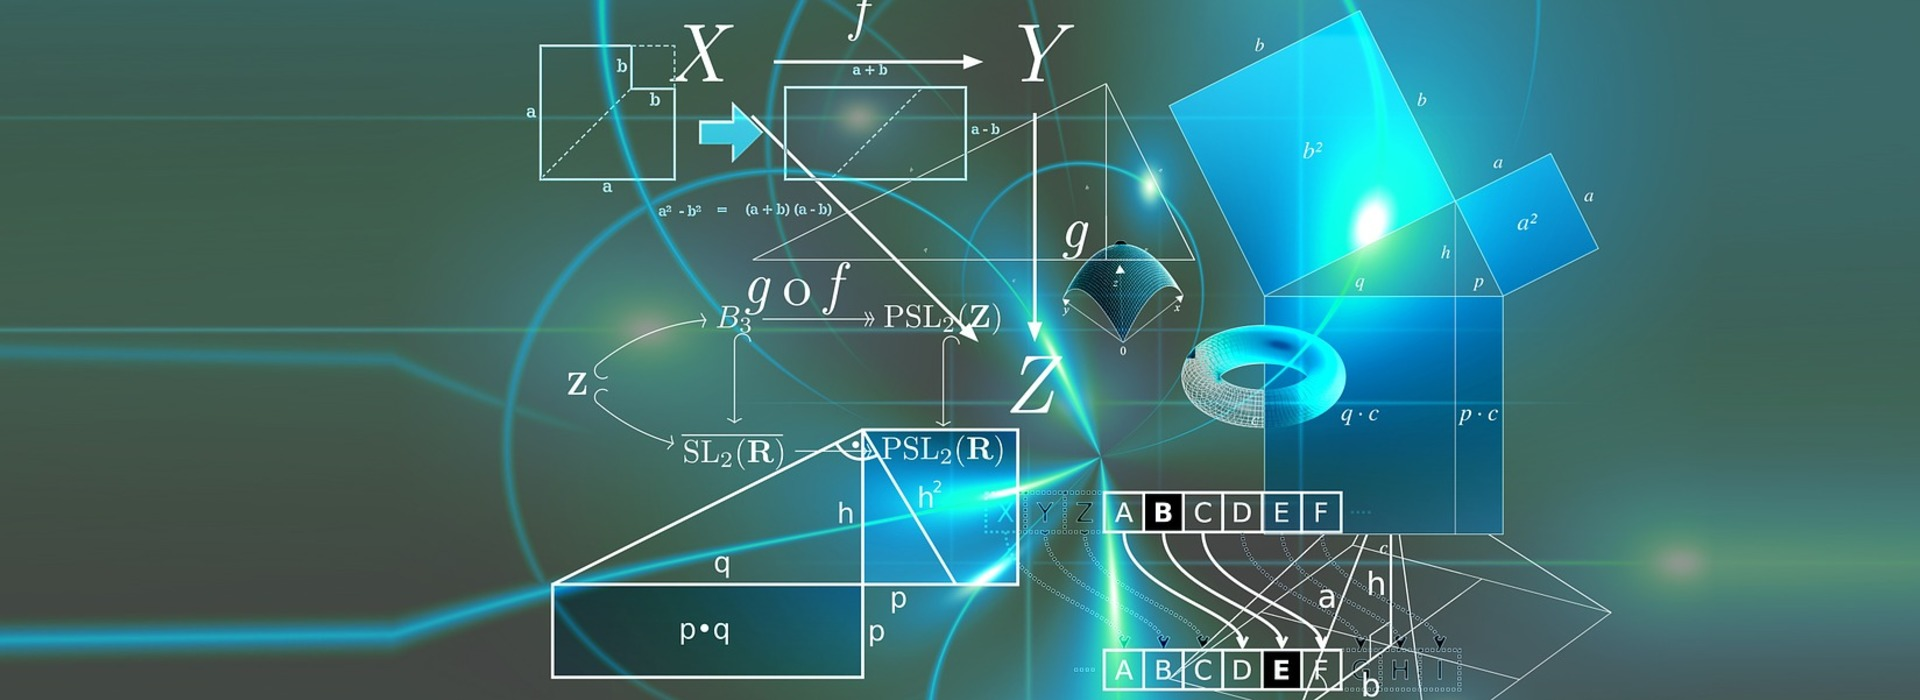 Отдел интеграции образования и науки